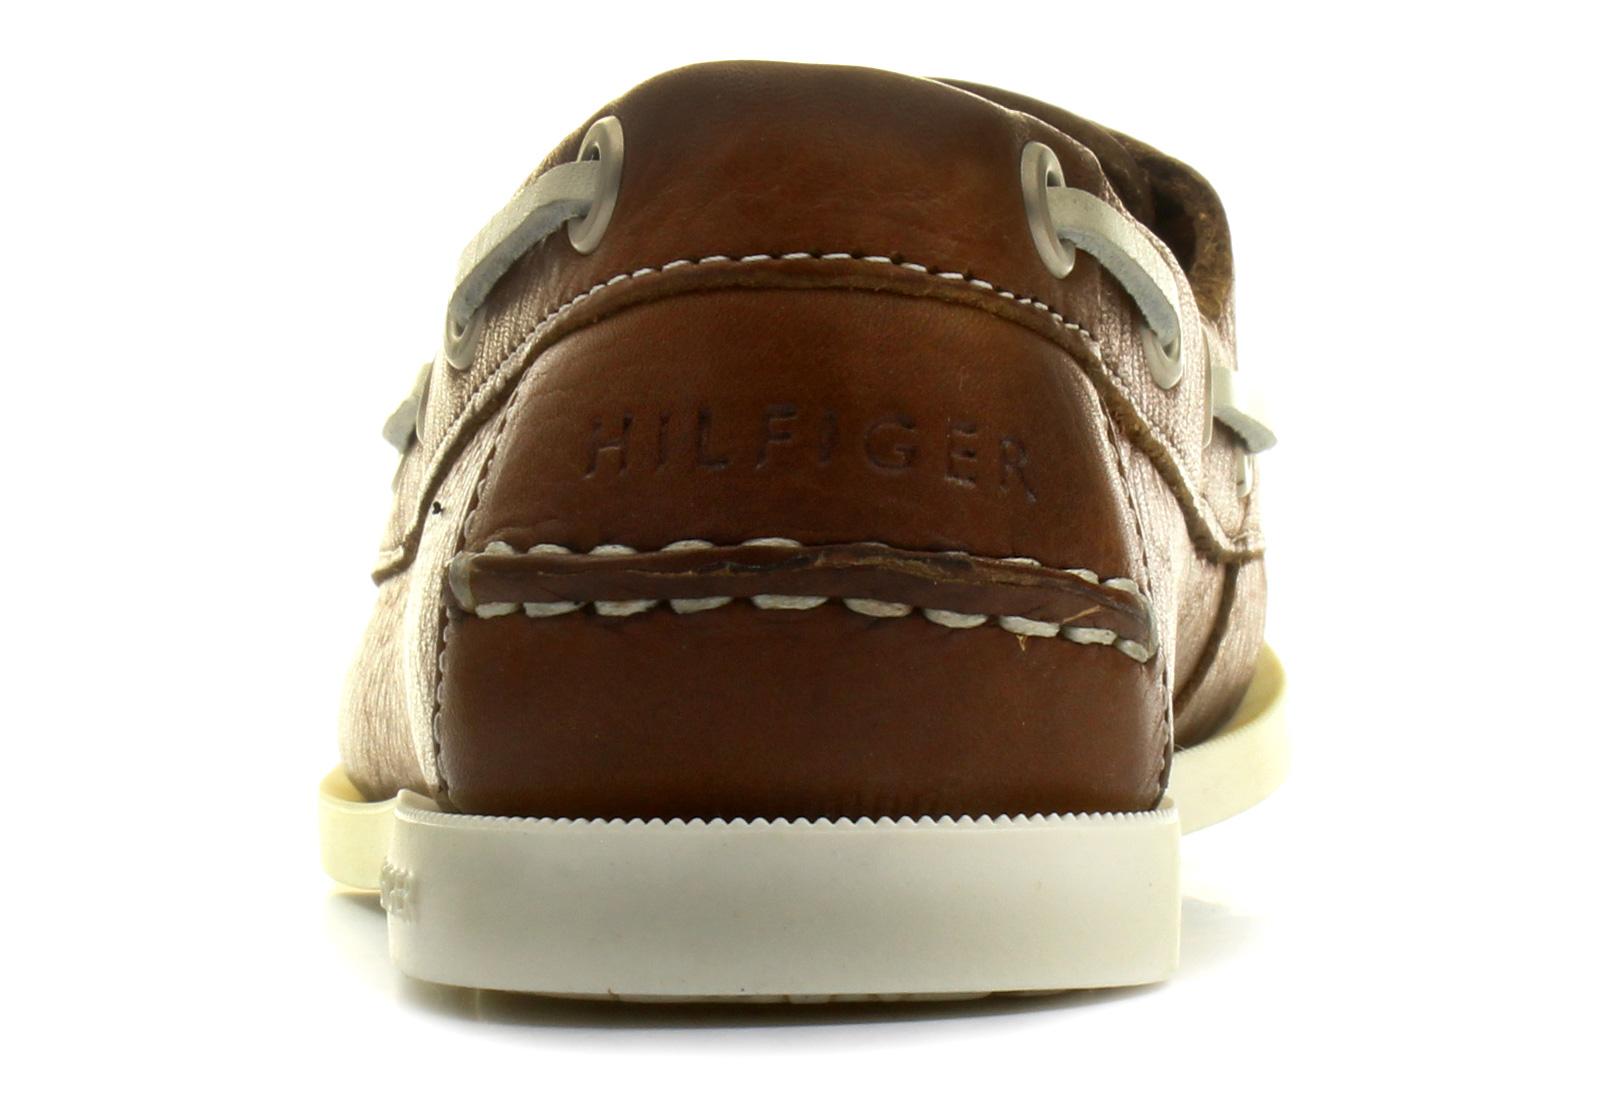 pin tommy hilfiger martha boots schuhe beige on pinterest. Black Bedroom Furniture Sets. Home Design Ideas